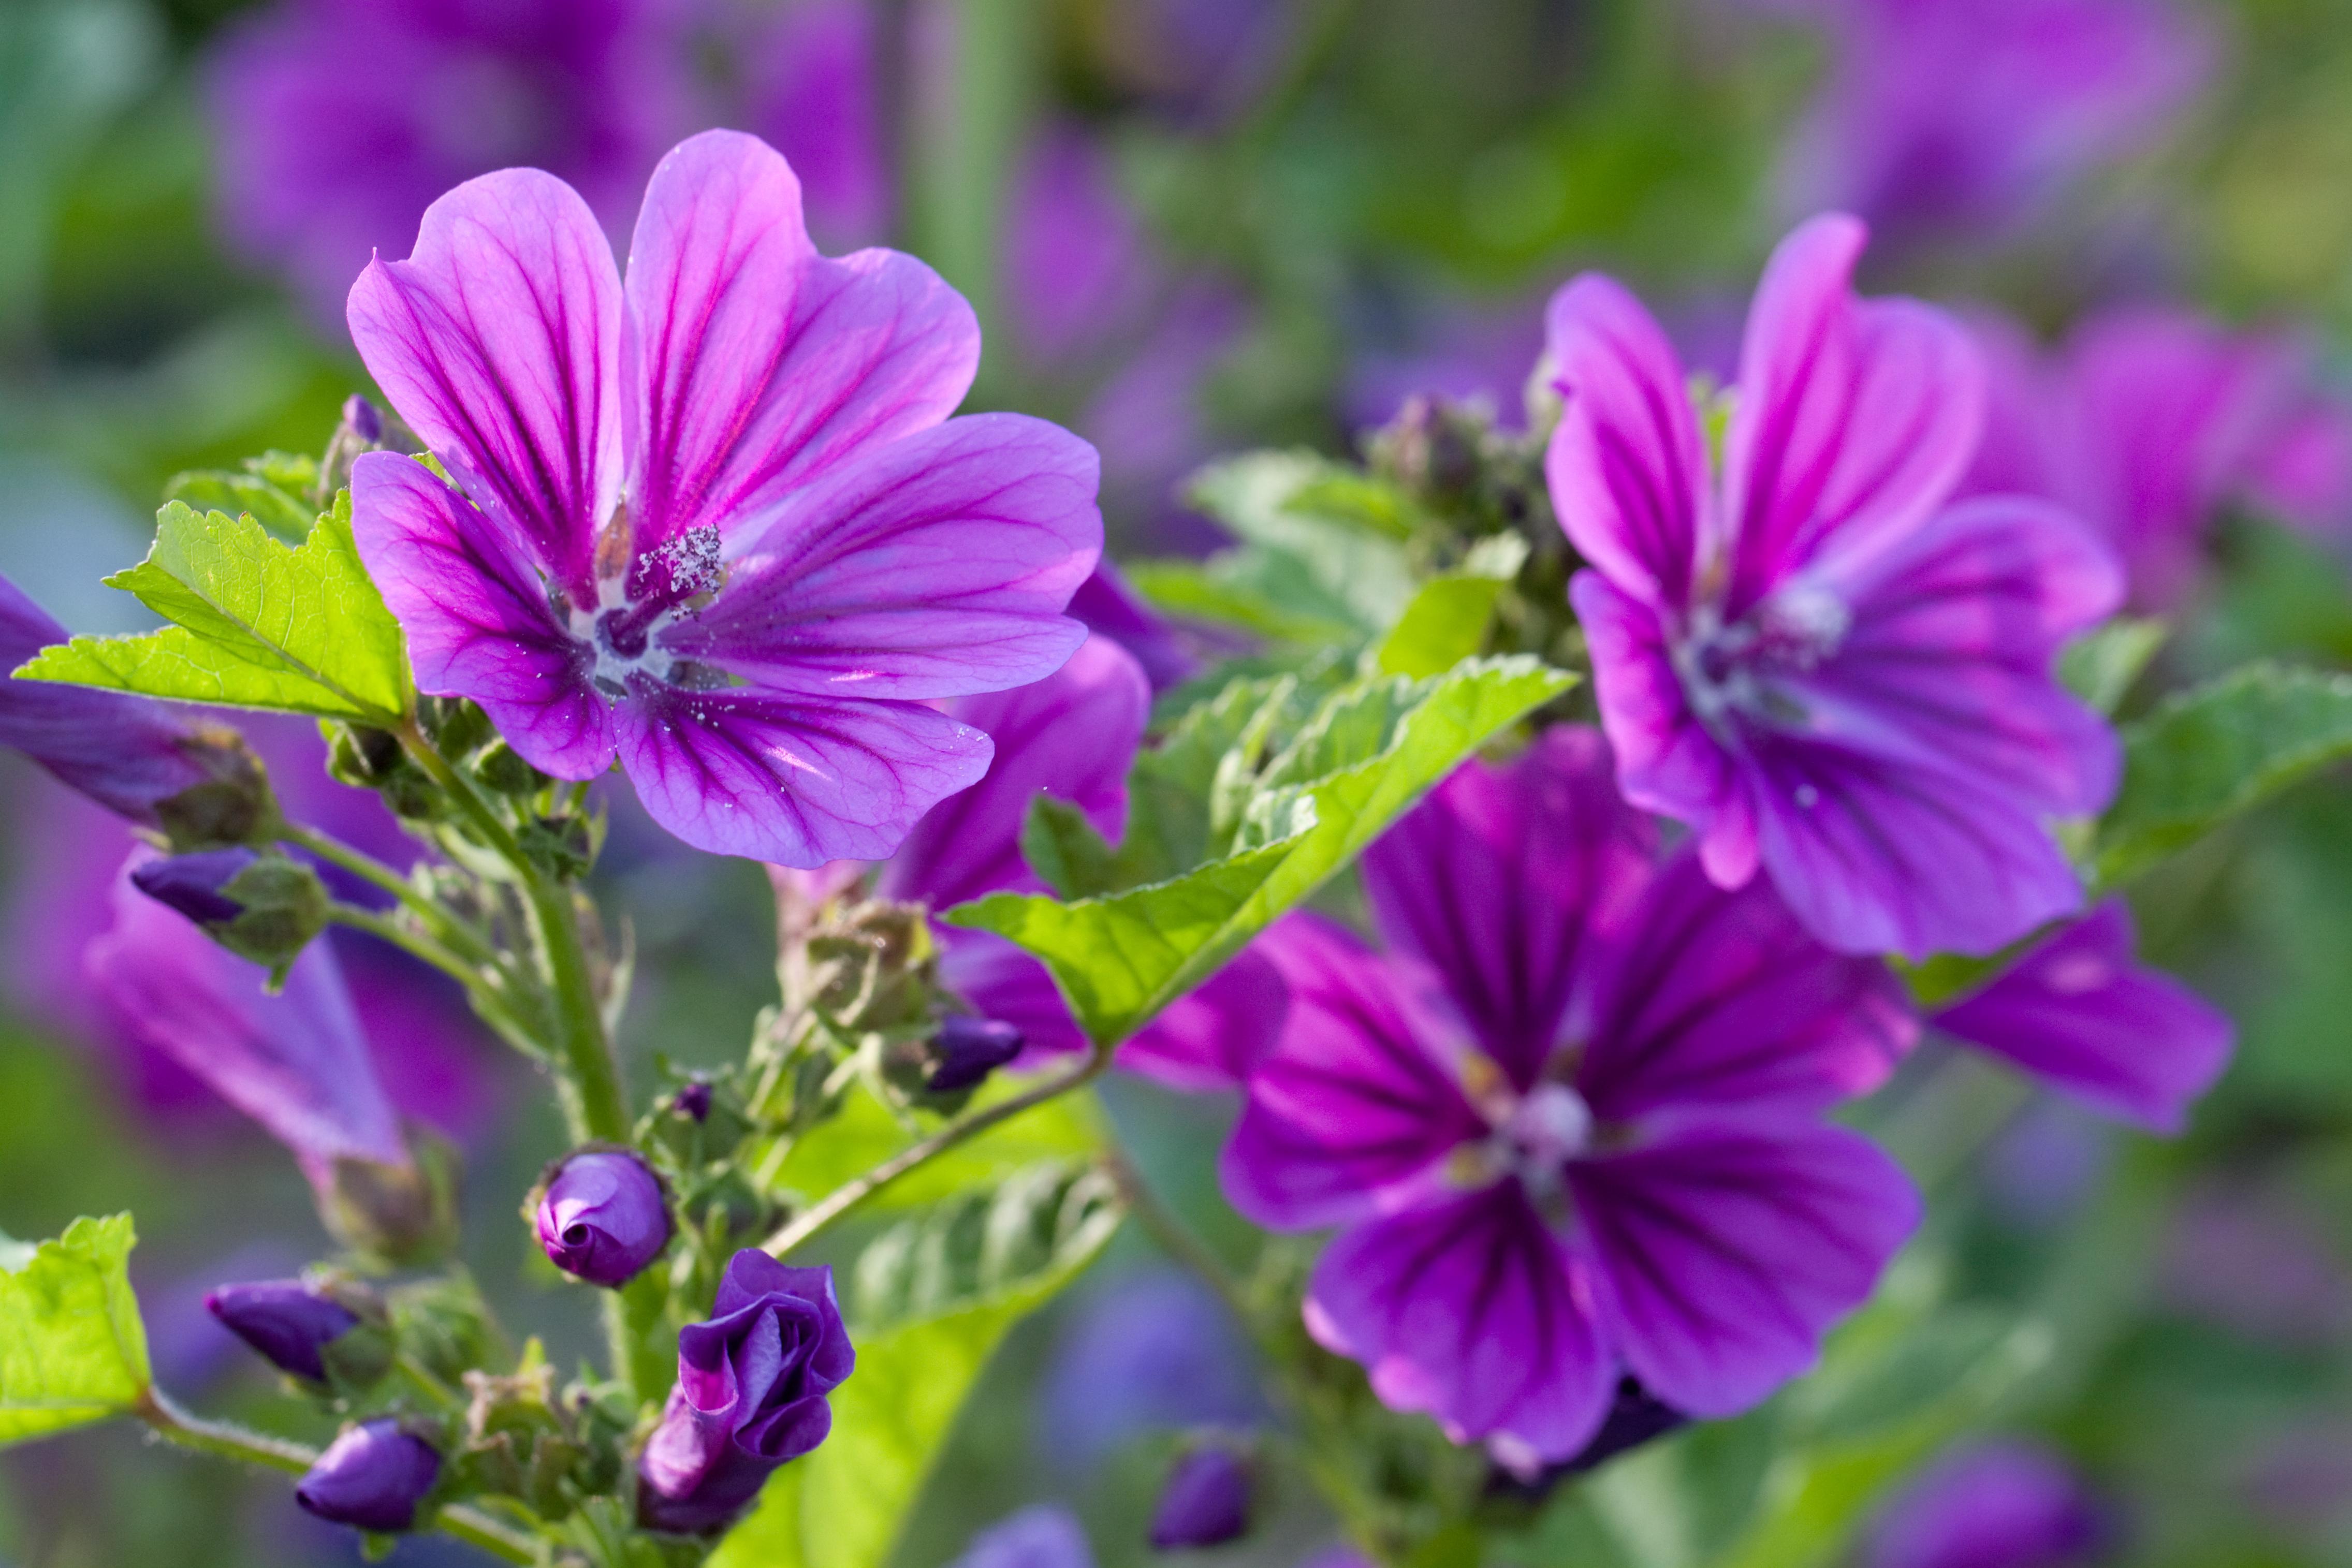 File Flower mon mallow Flickr nekonomania Wikimedia mons